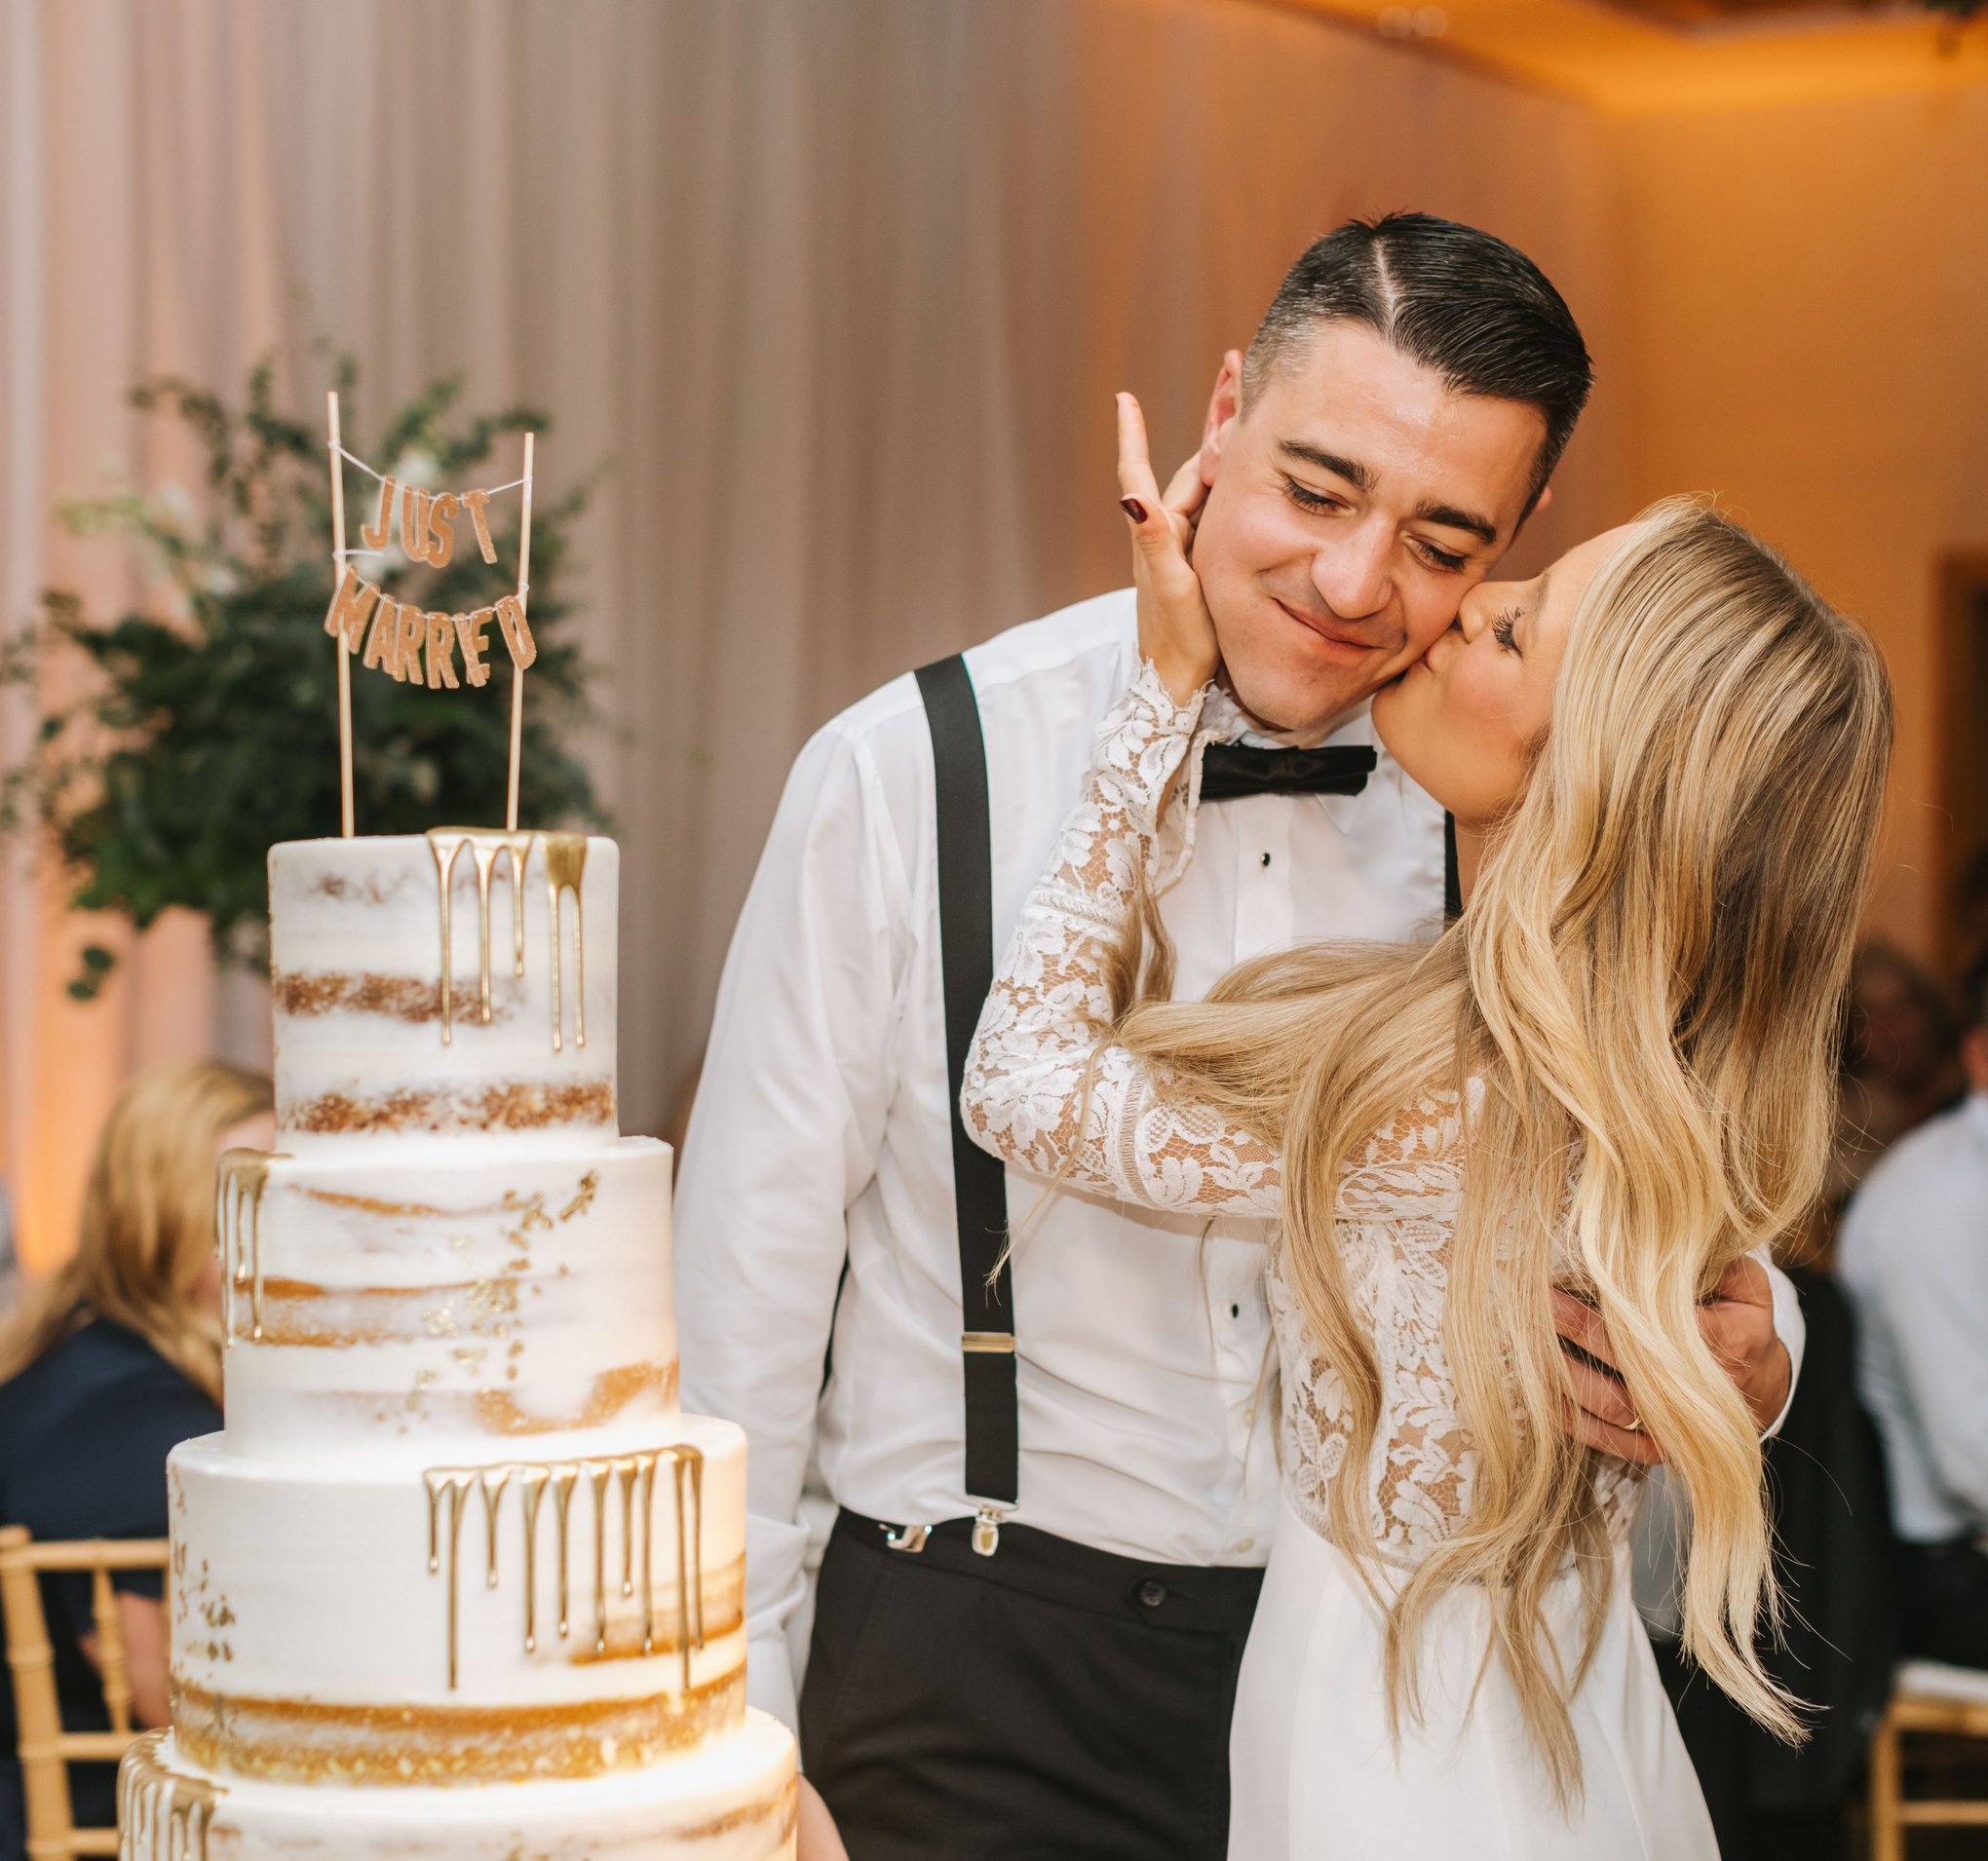 Wequassett-Wedding-Photographer-Cape-Cod-Boston-Lena-Mirisola-46.jpg